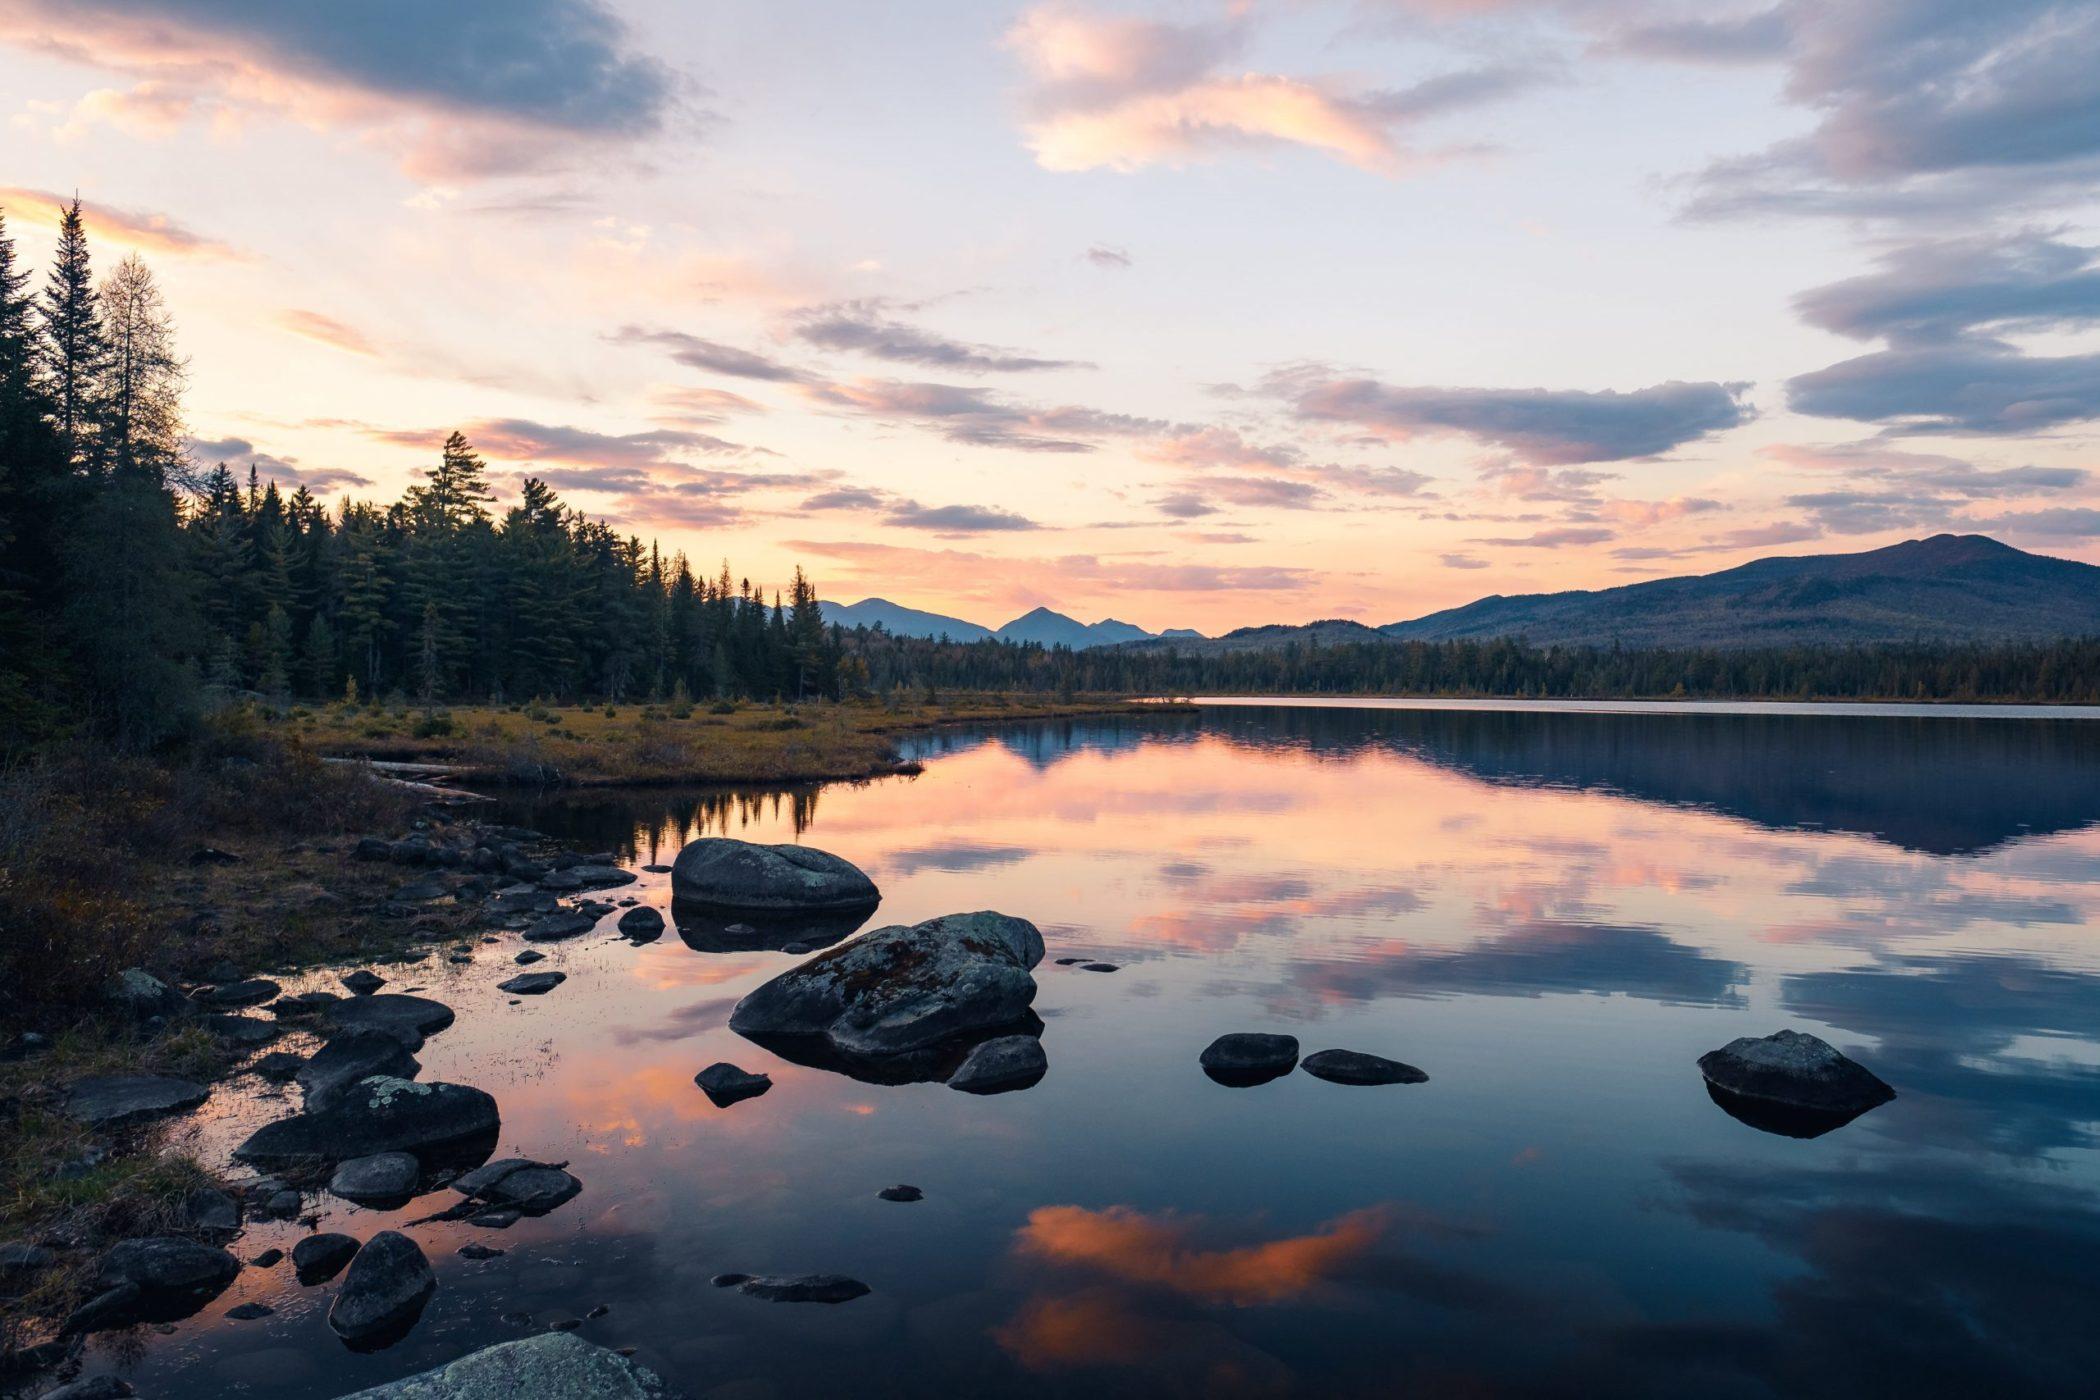 Adirondack pond at sunset